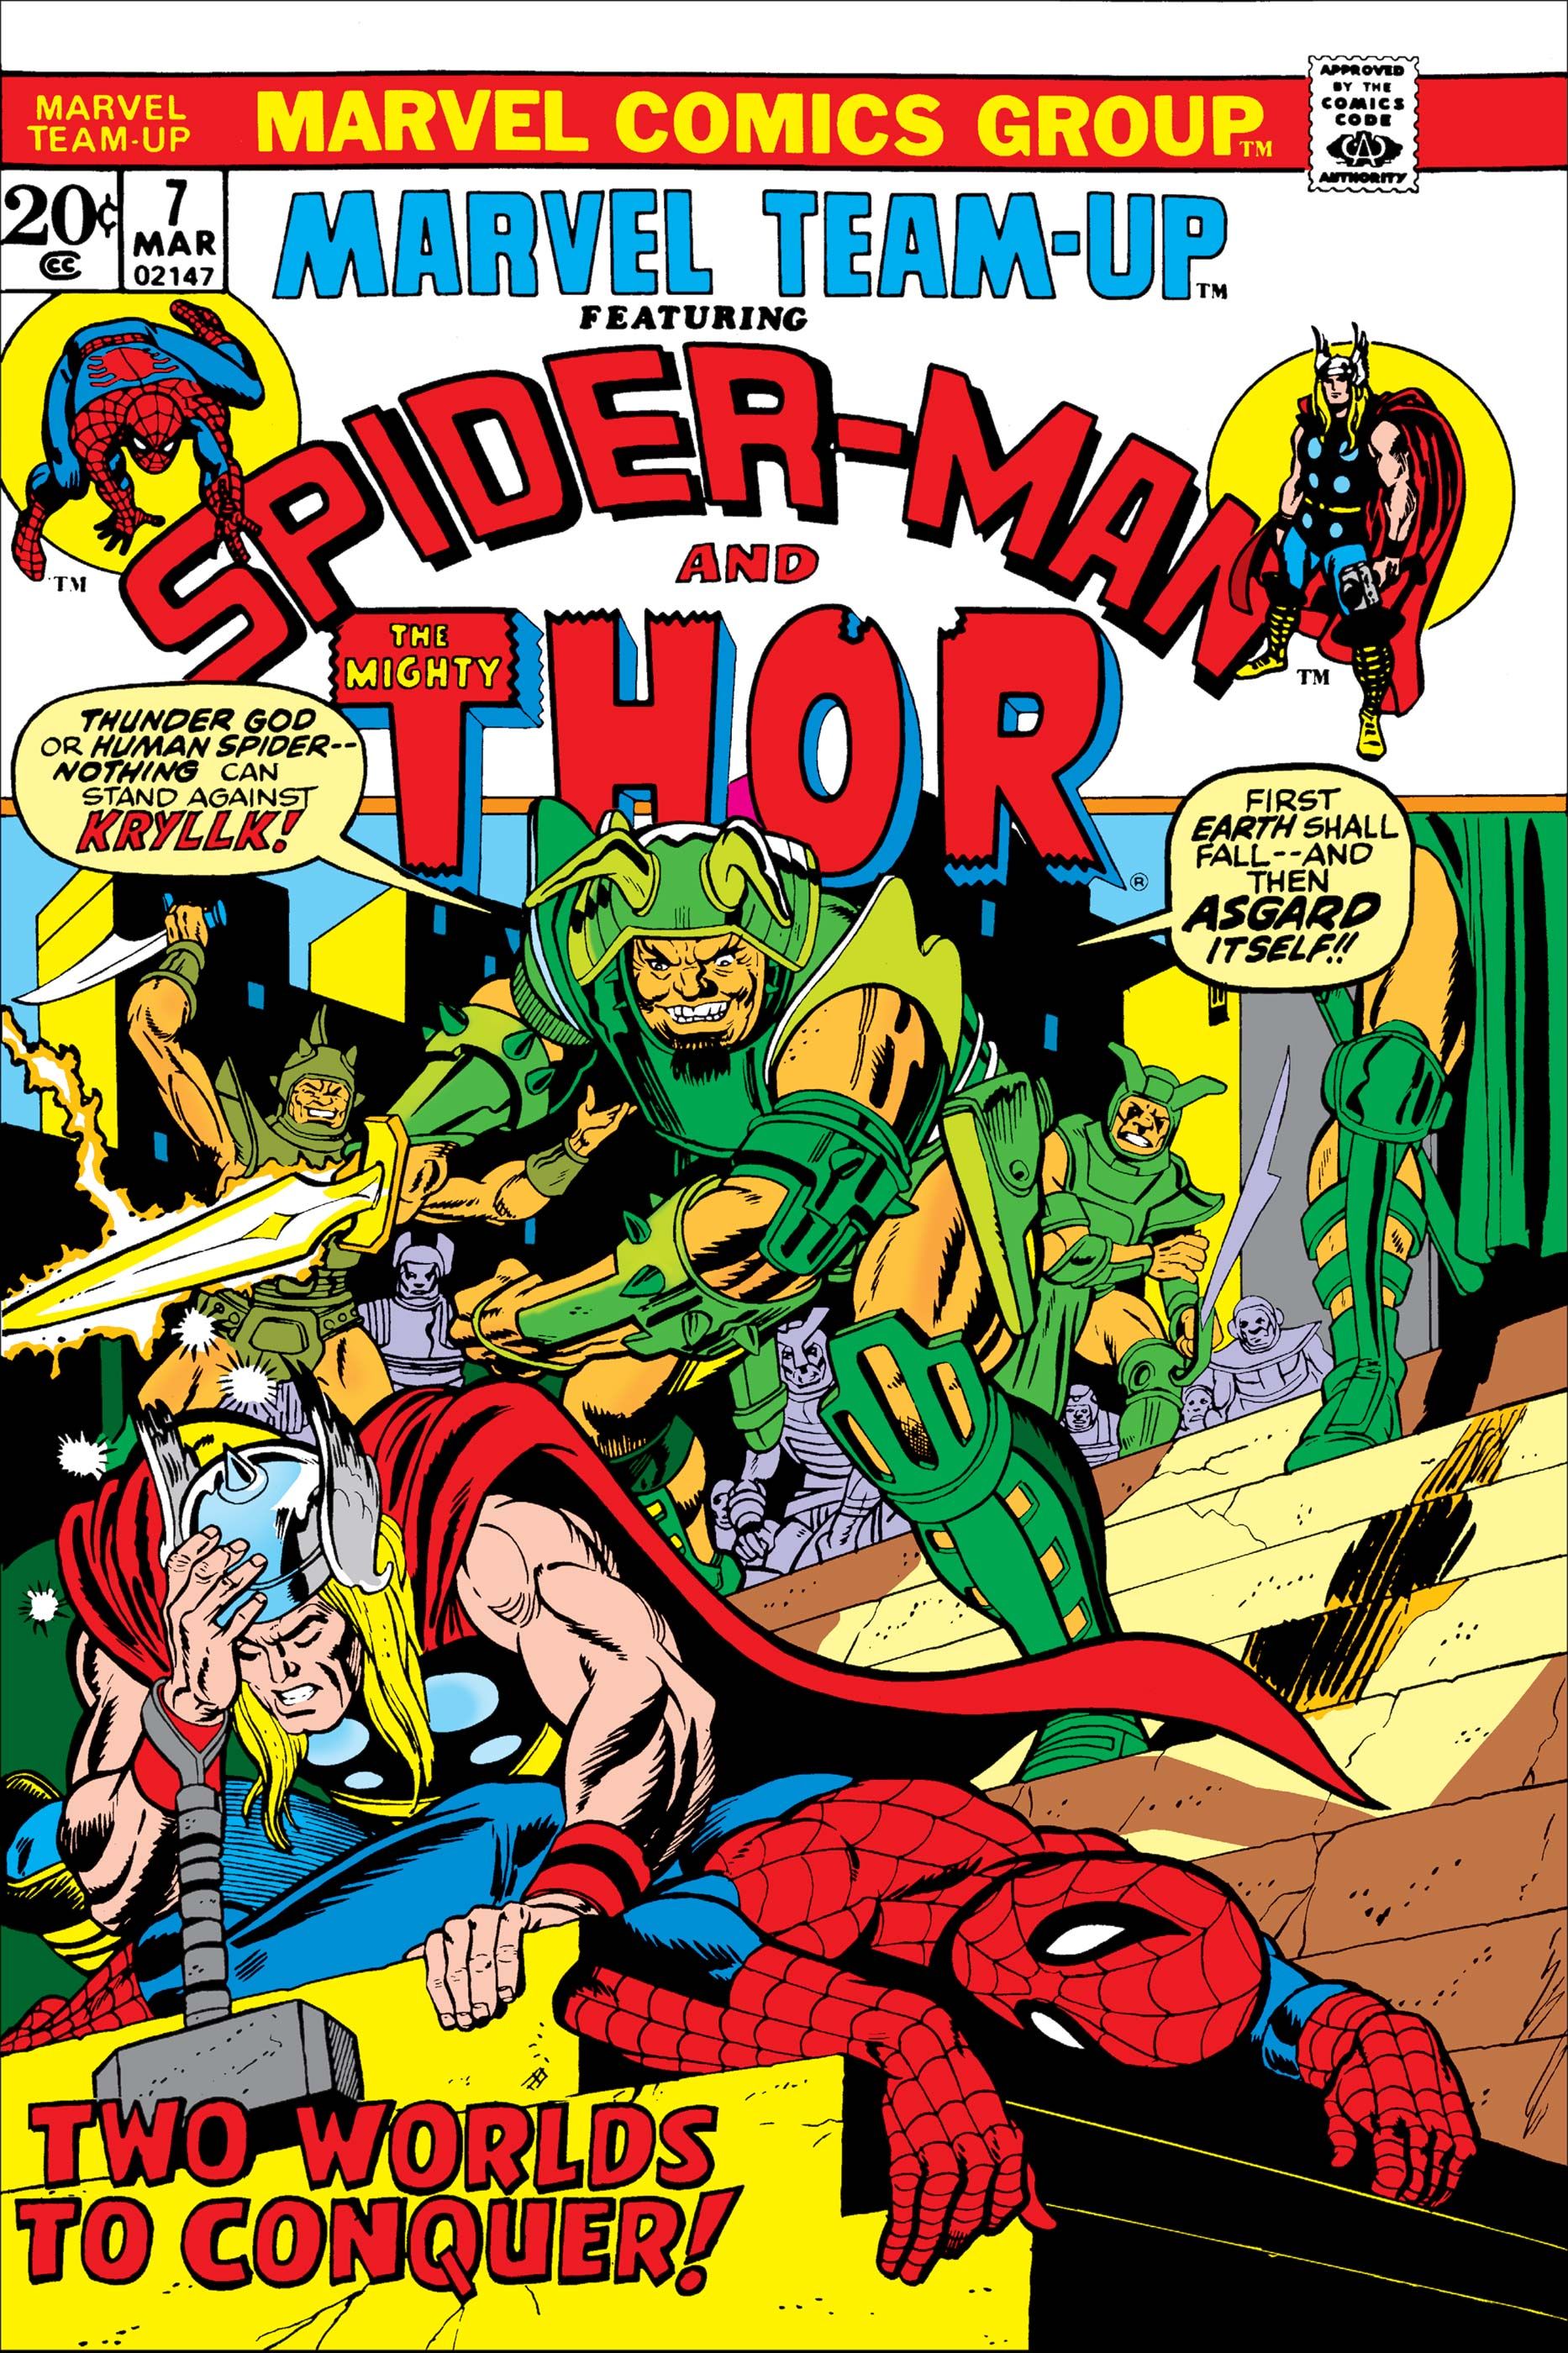 Marvel Team-Up (1972) #7